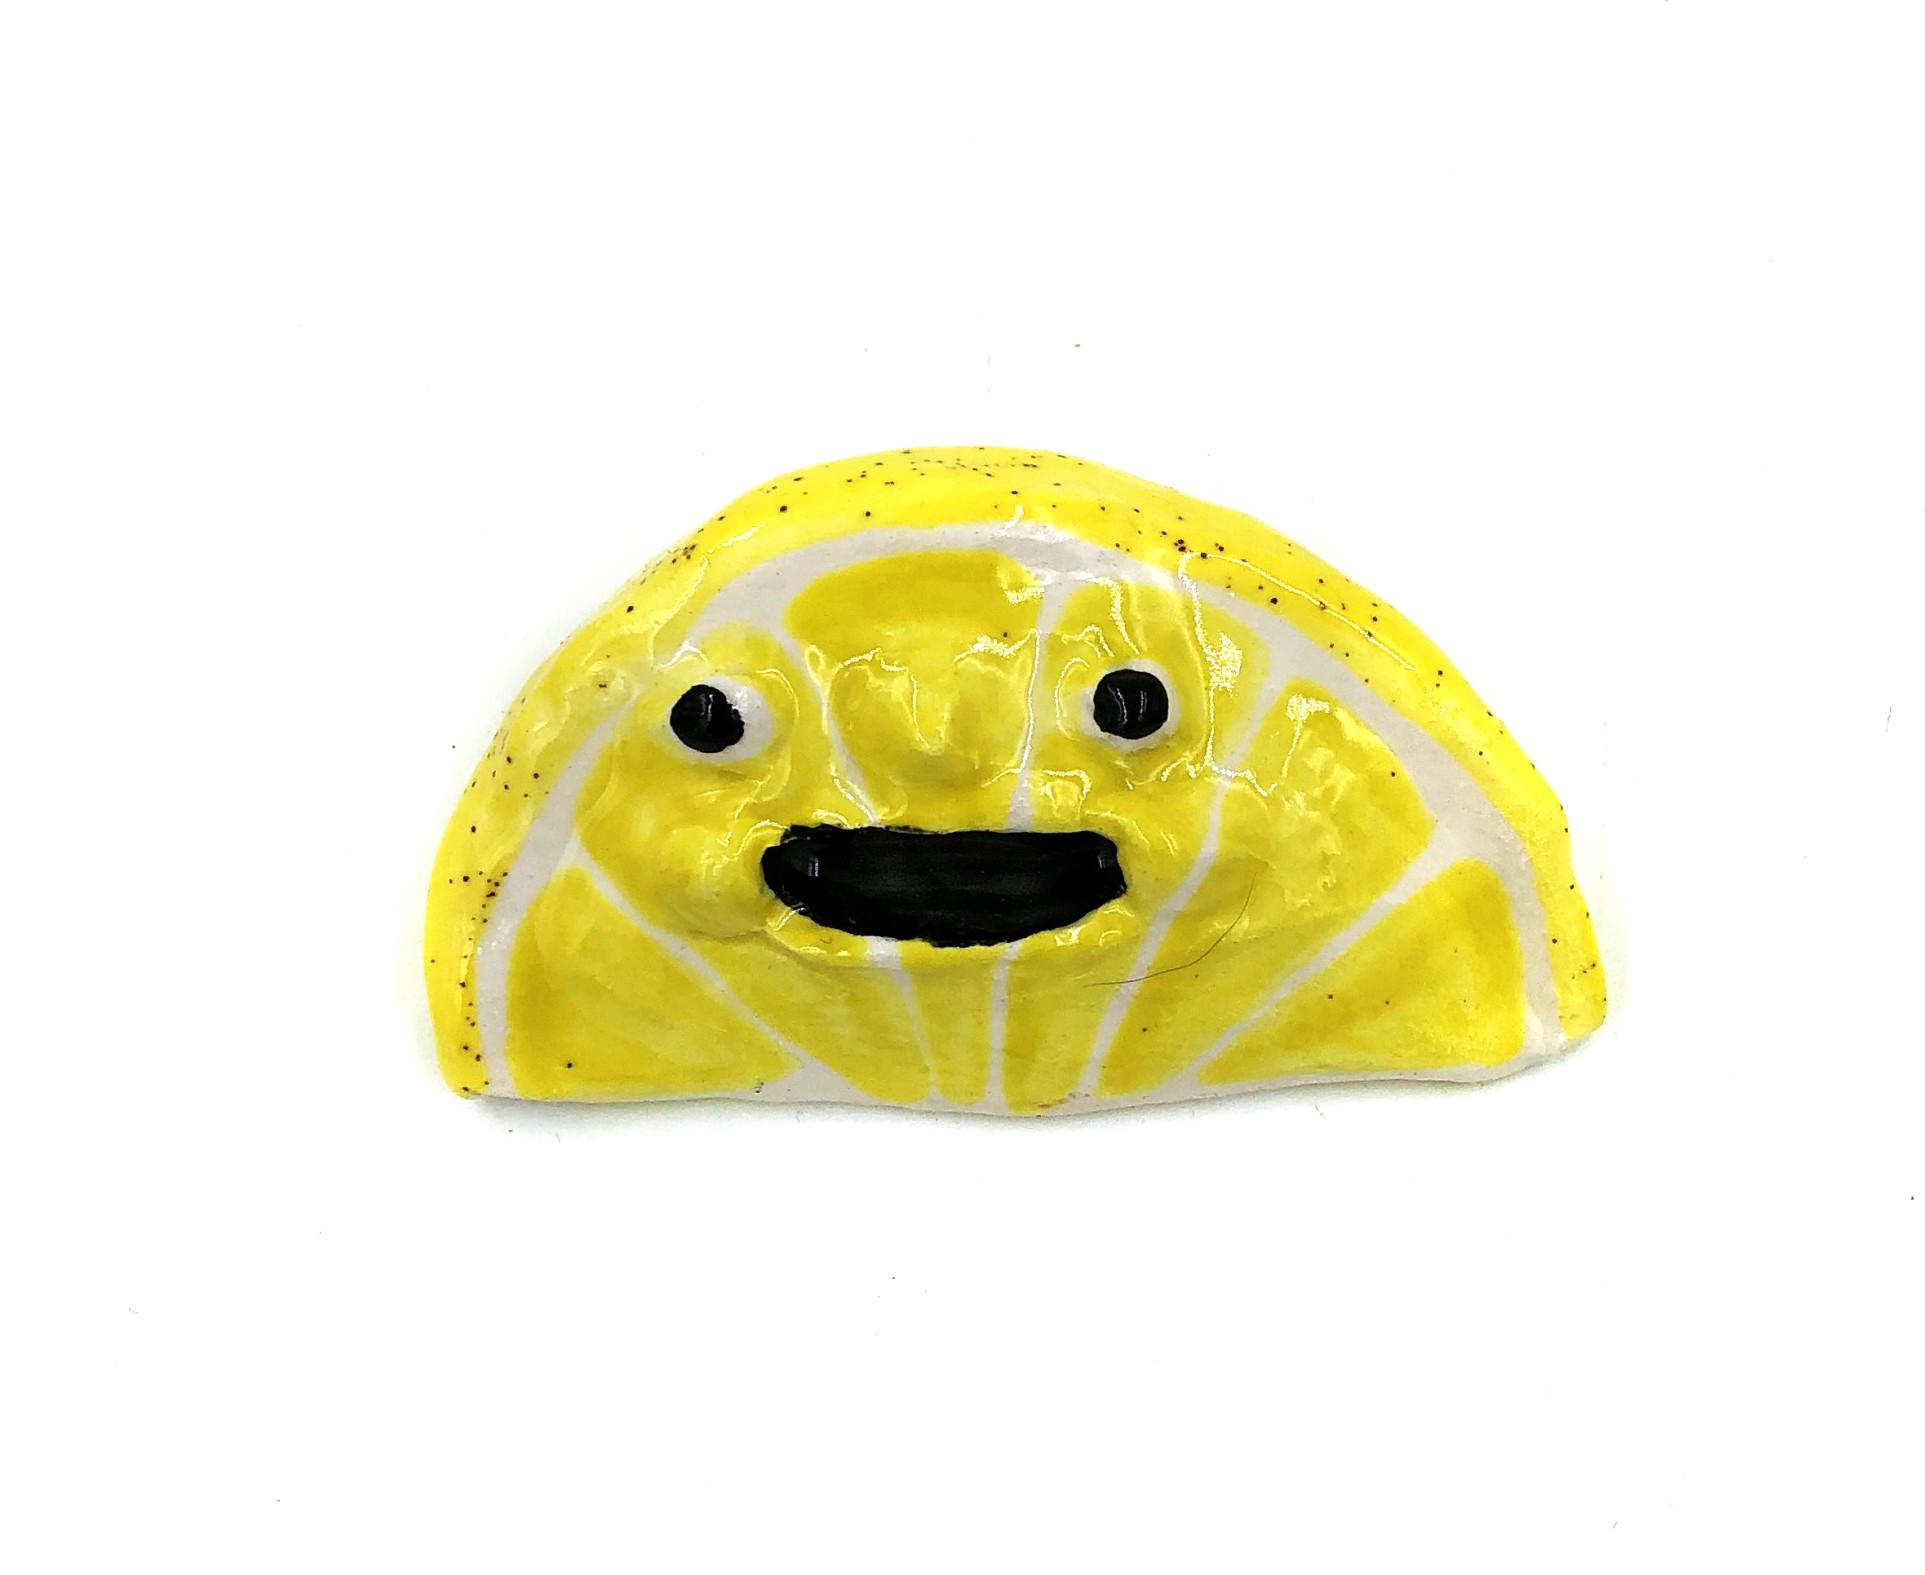 Katie Kimmel, Lemon 4, 2019